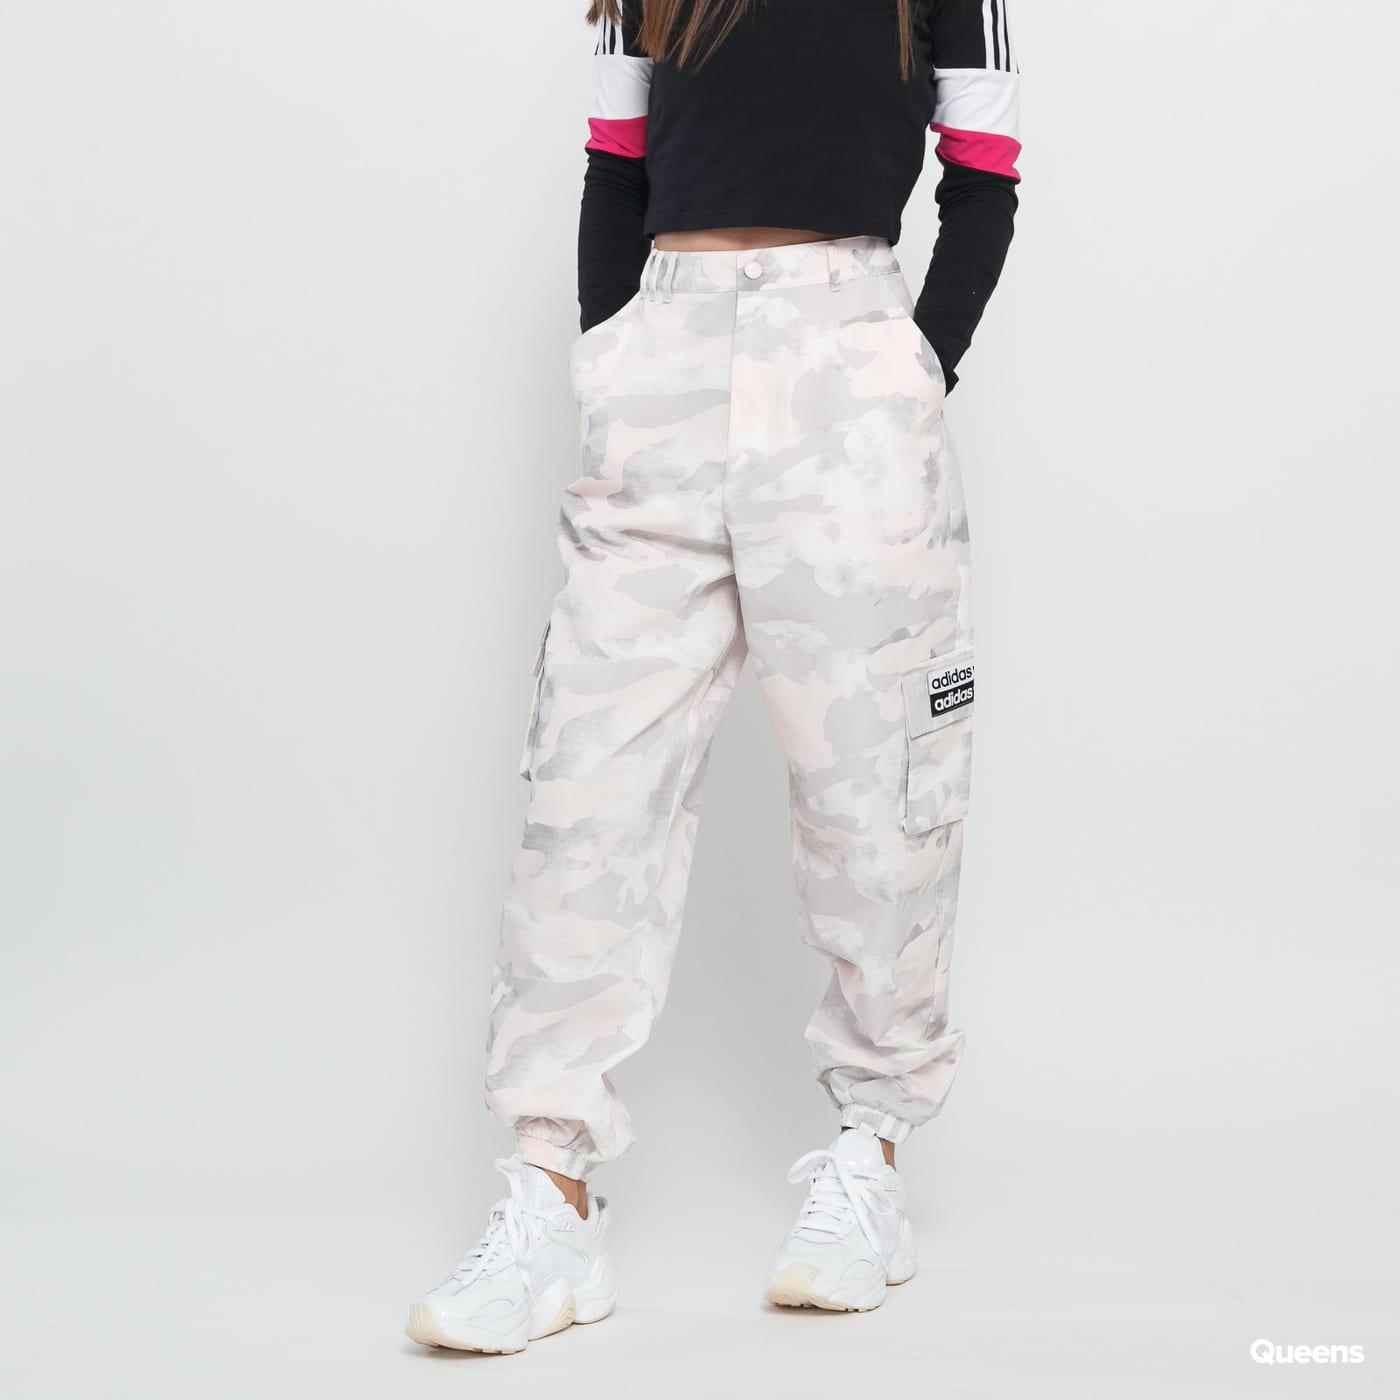 adidas pants pink